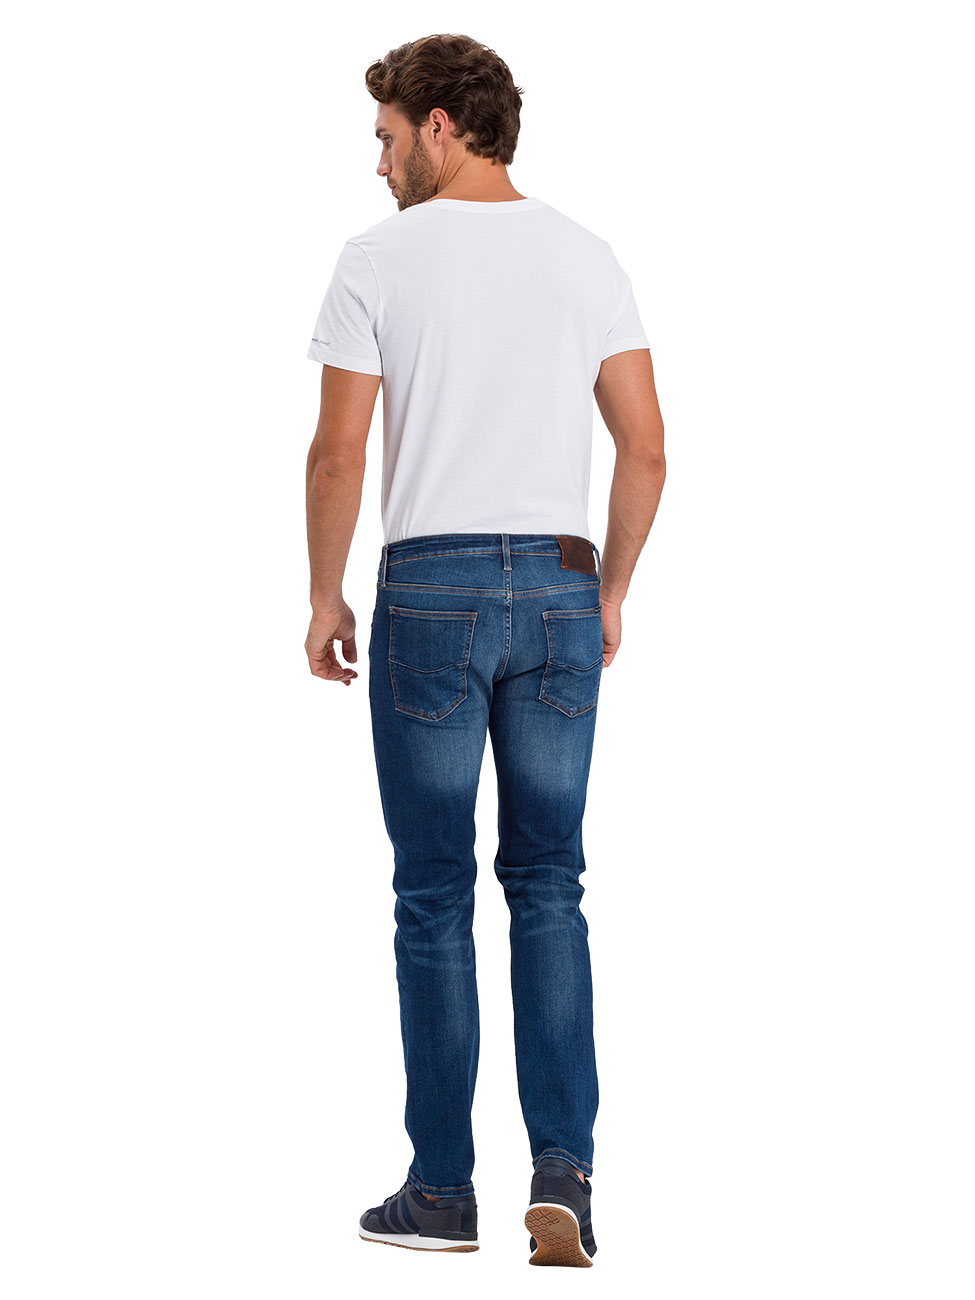 cross-jeans-herren-jeans-damien-slim-fit-blau-mid-blue, 59.81 EUR @ jeans